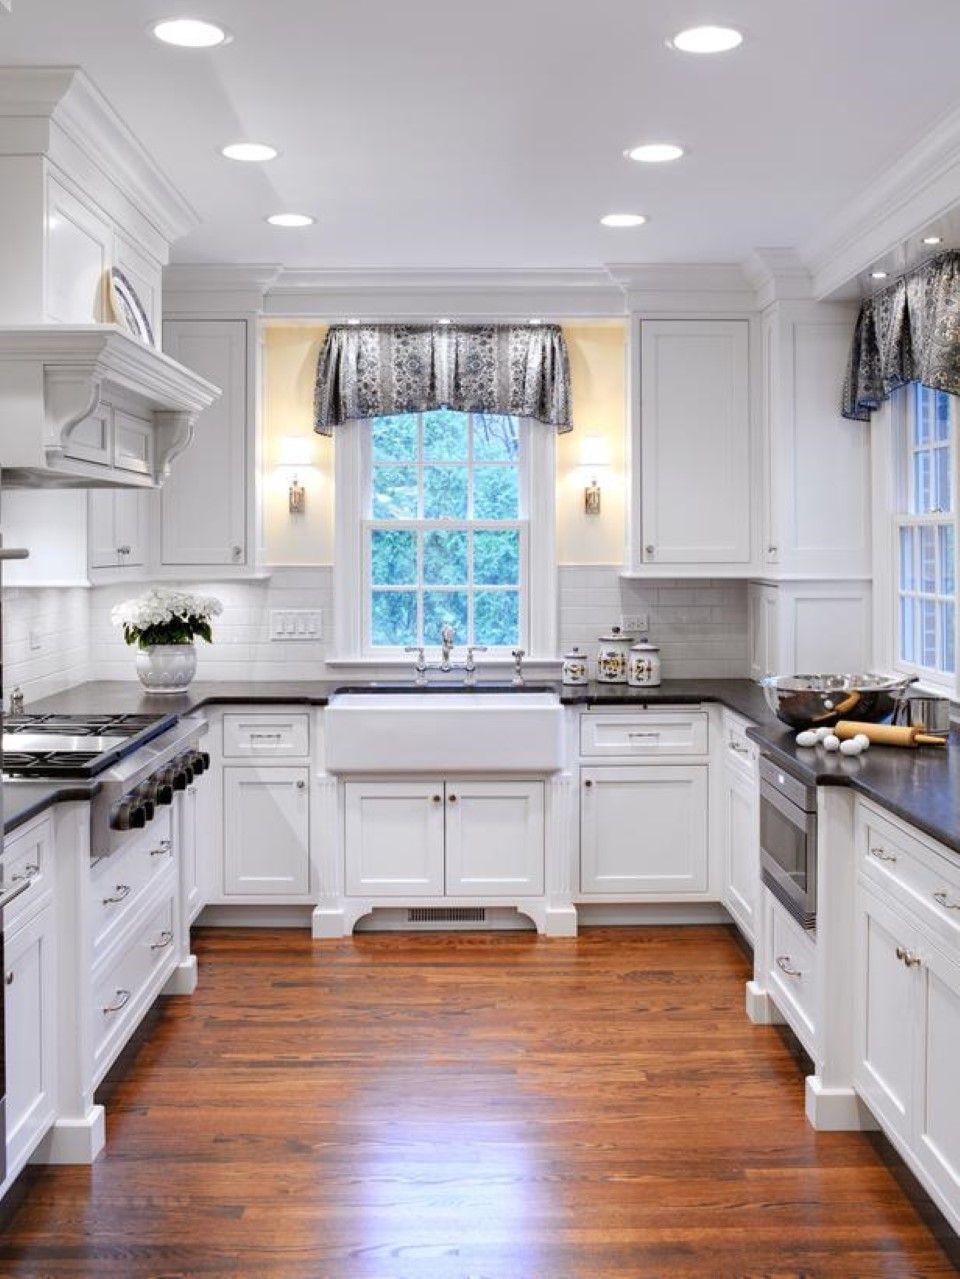 Dark Wood Floor Design in Cool Cottage U-shaped Kitchen Plus Apron U Shaped Kitchens With Sink Under Window on u shaped copper sink, u shaped bathroom vanity, v shaped kitchen sink, u shaped contemporary kitchens,